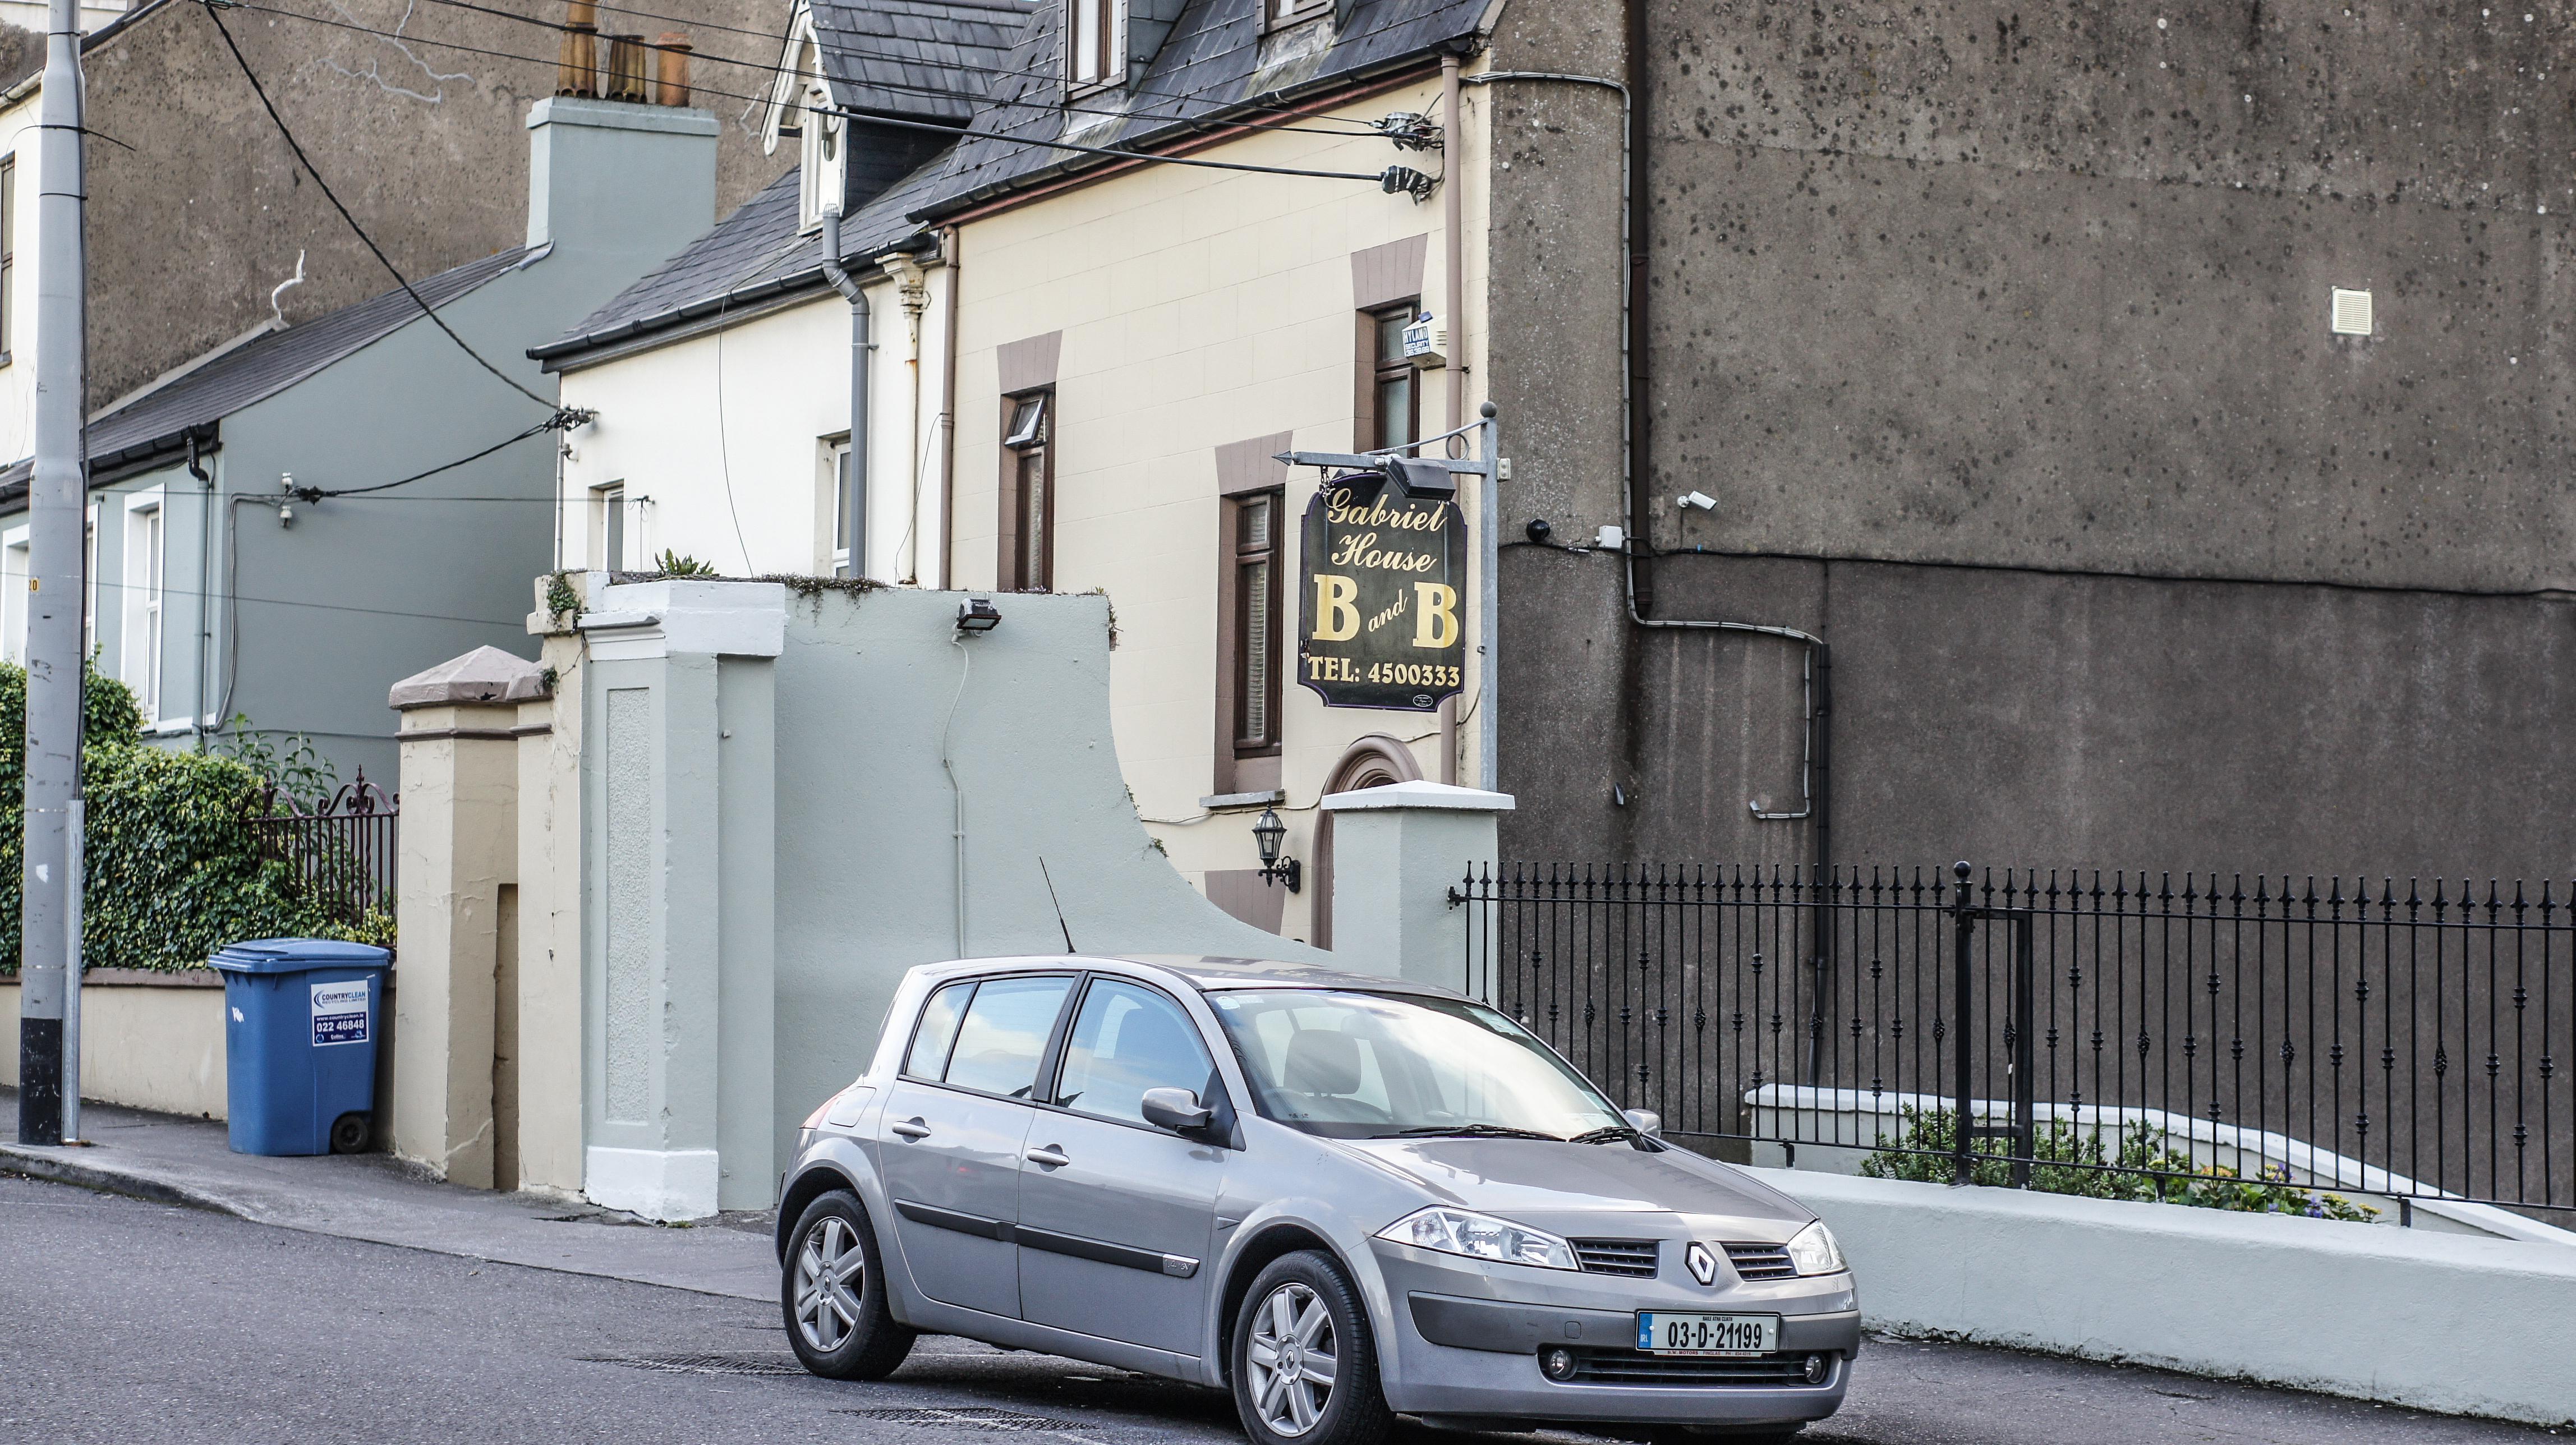 file:cork, st. luke's and surrounding area (gabriel house hotel